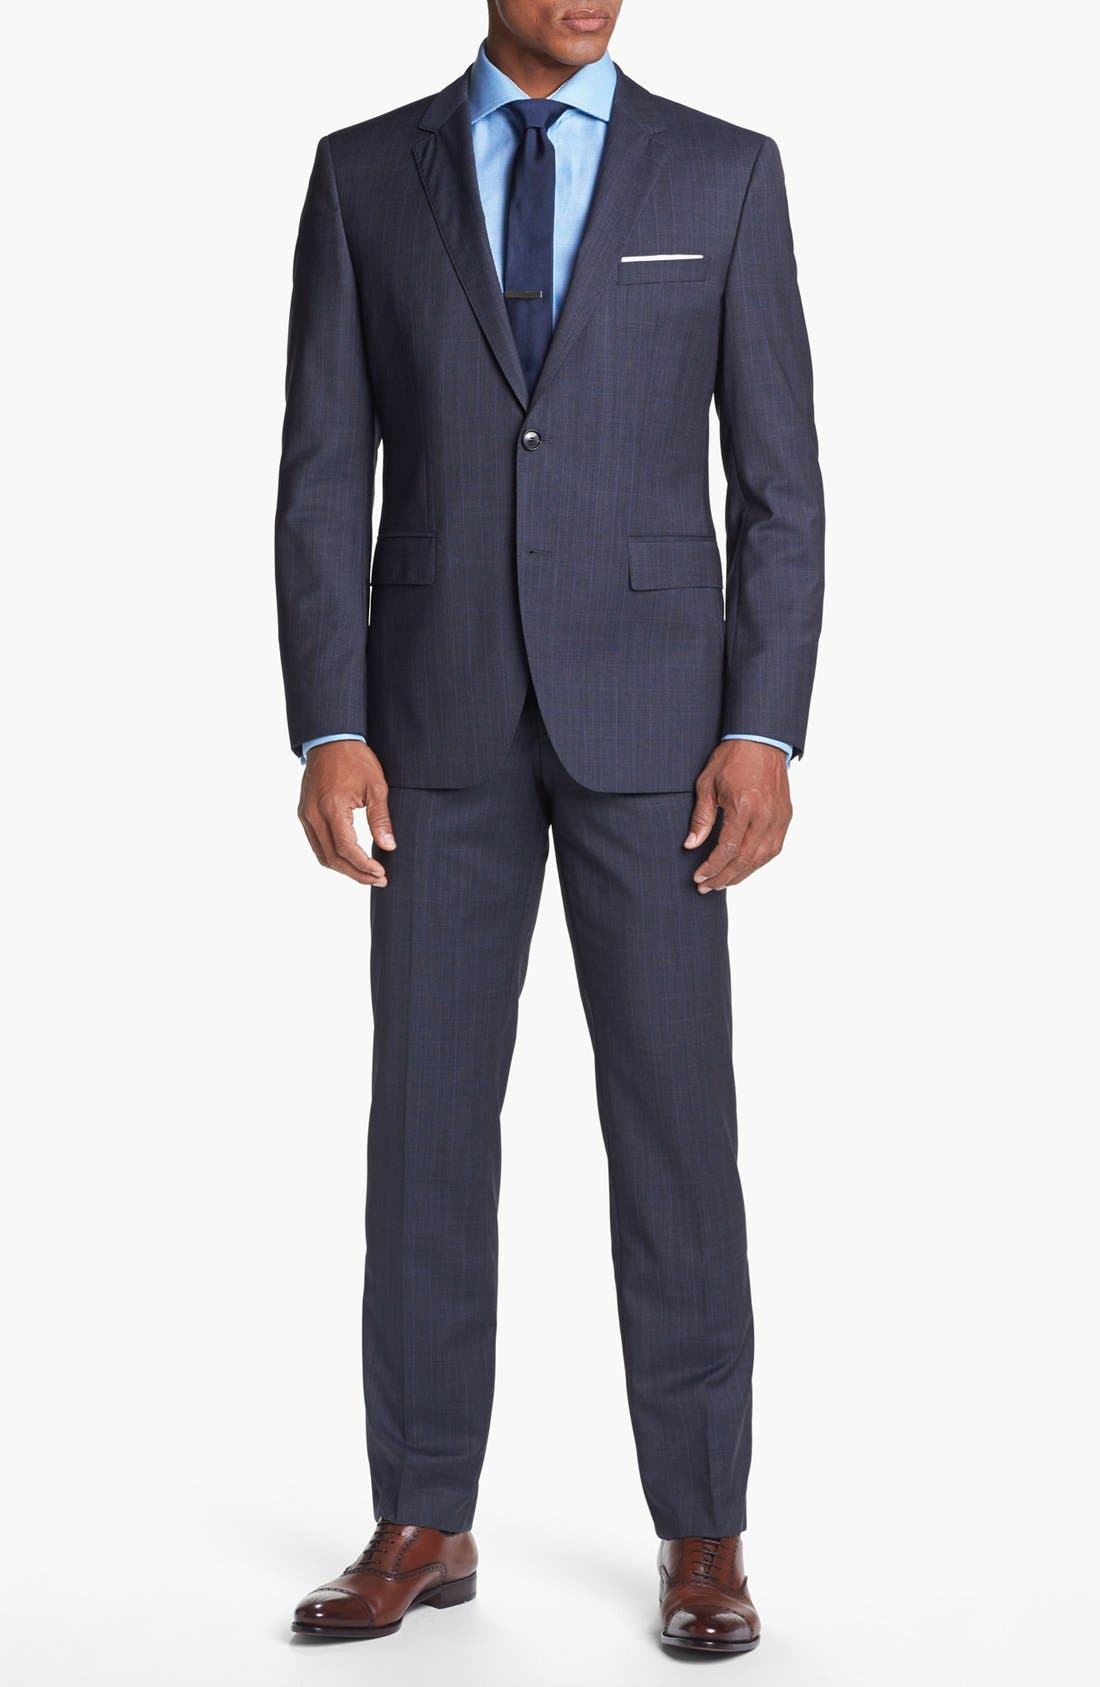 Alternate Image 1 Selected - BOSS HUGO BOSS 'James/Sharp' Trim Fit Plaid Suit